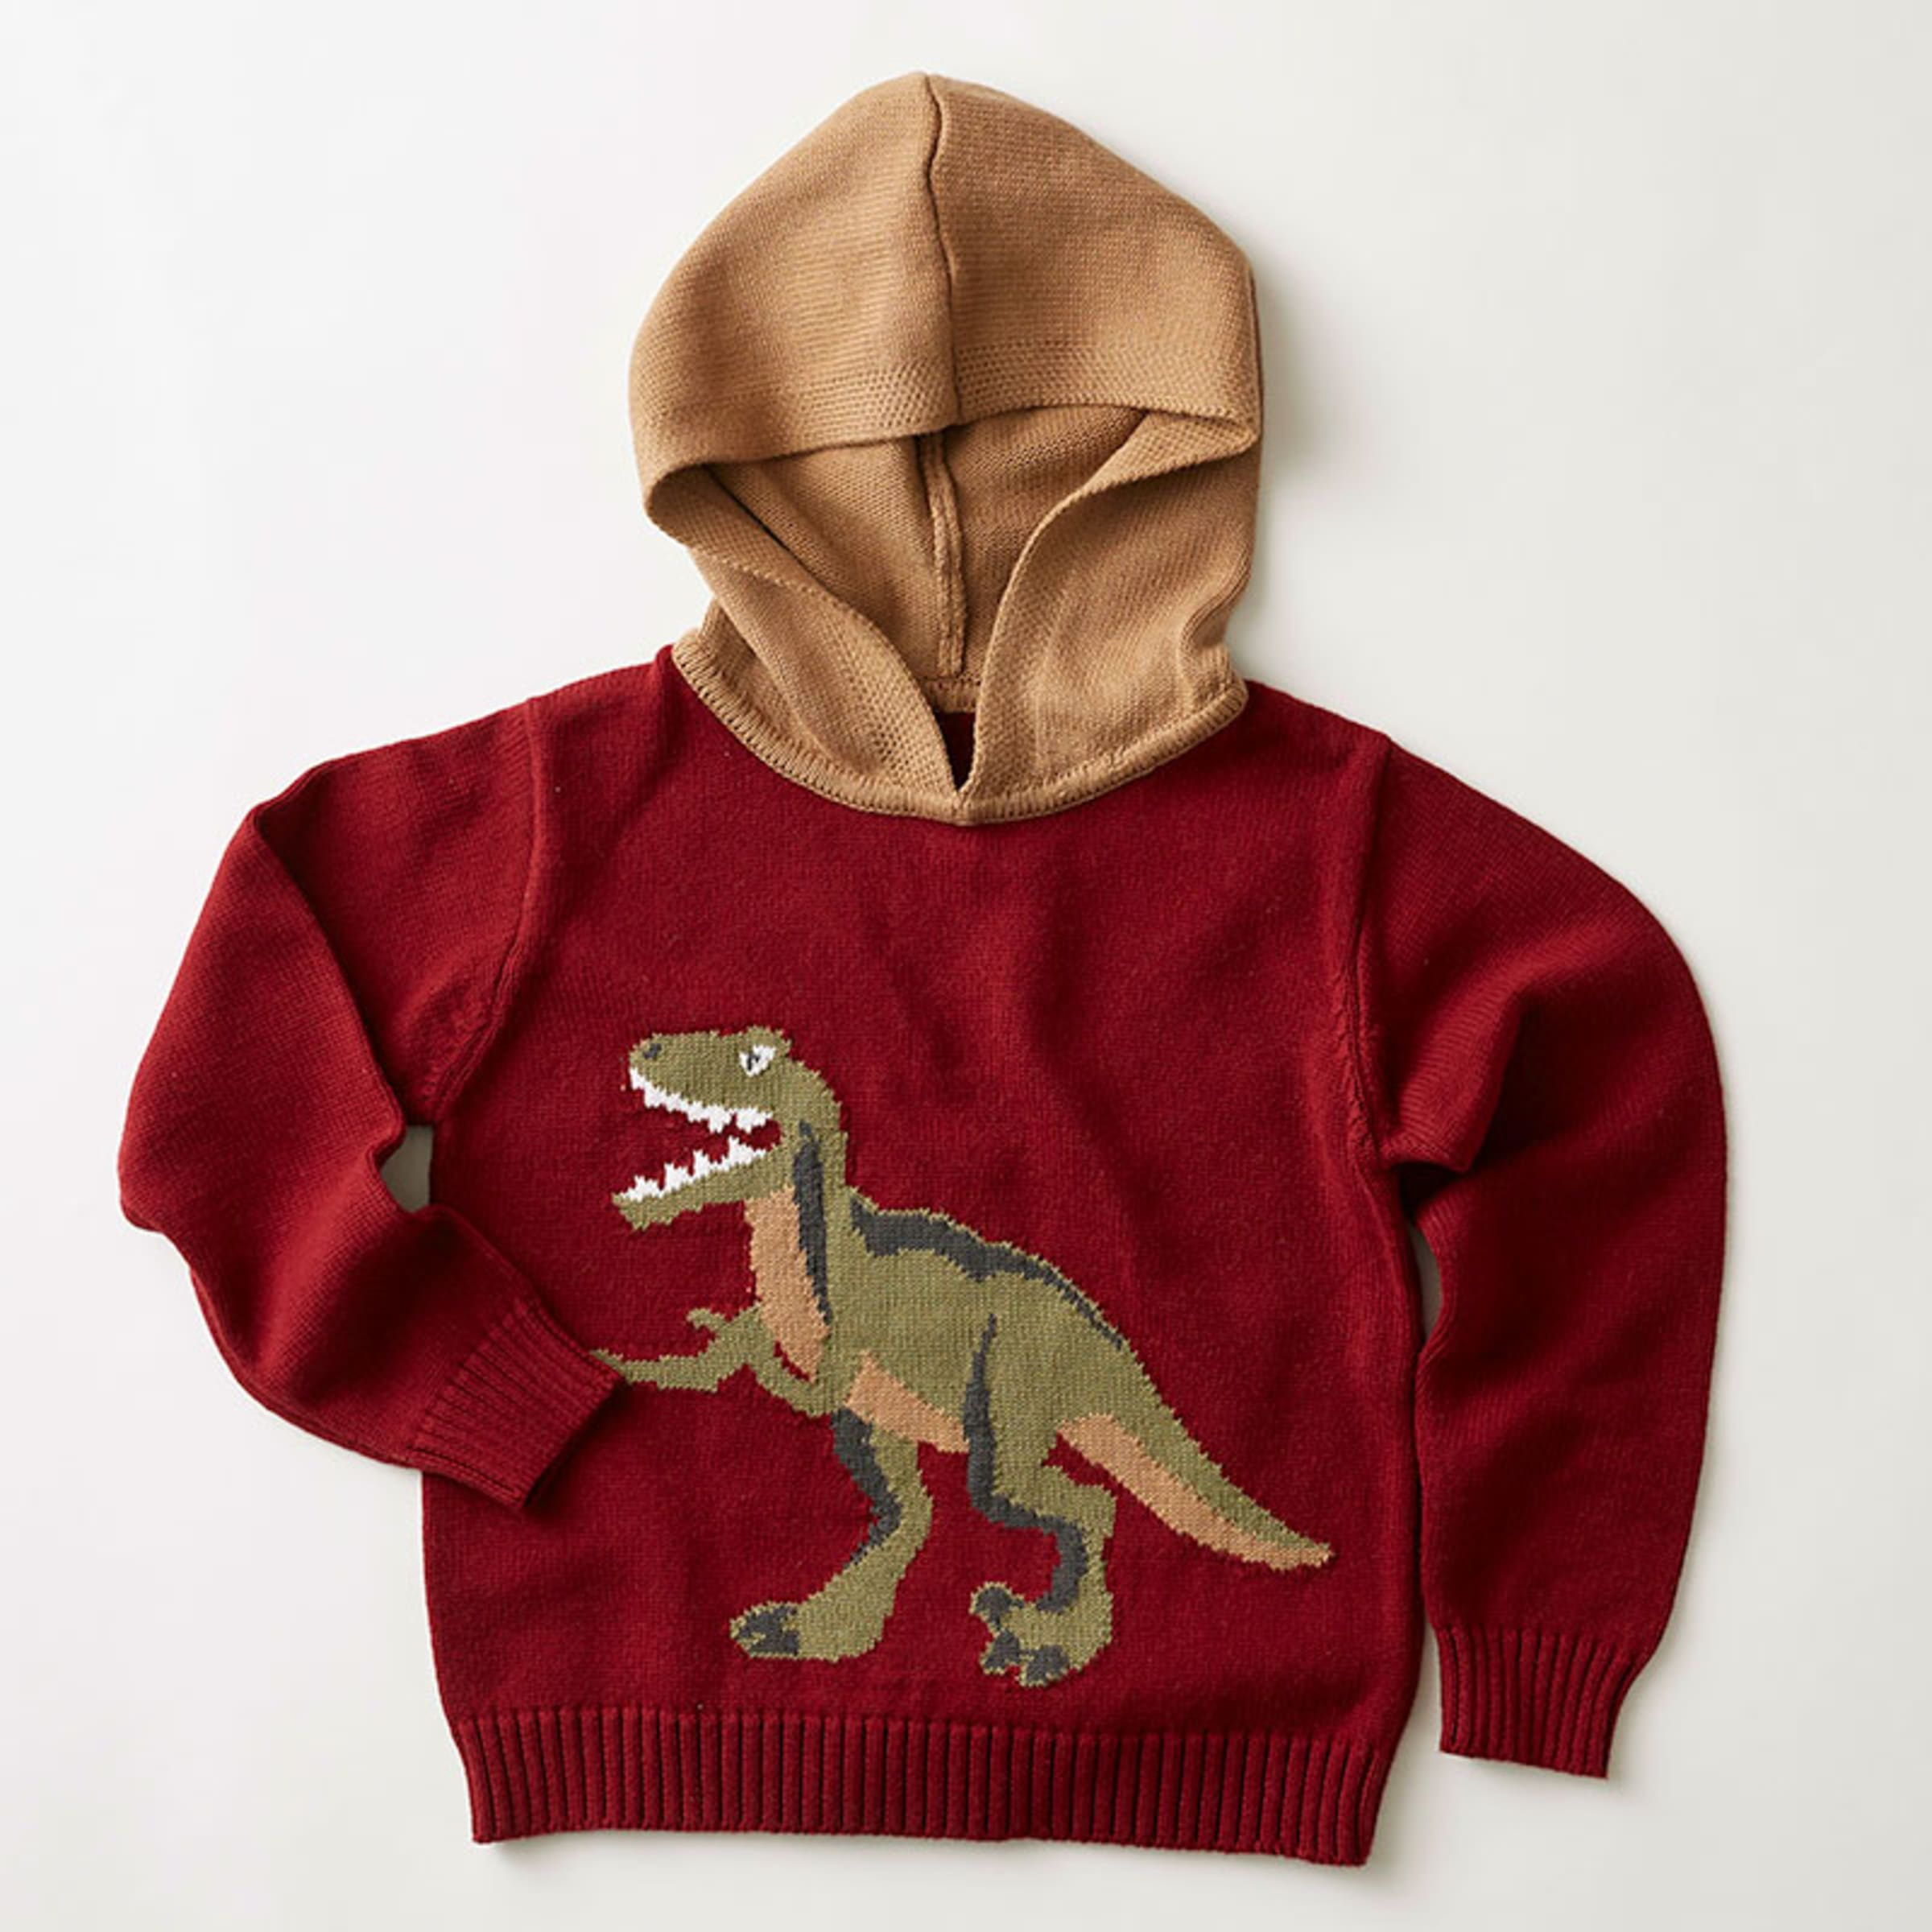 BNWT Unisex Kids Kukukid Black Dino Hoodie Jumper Pullover Sweatshirt